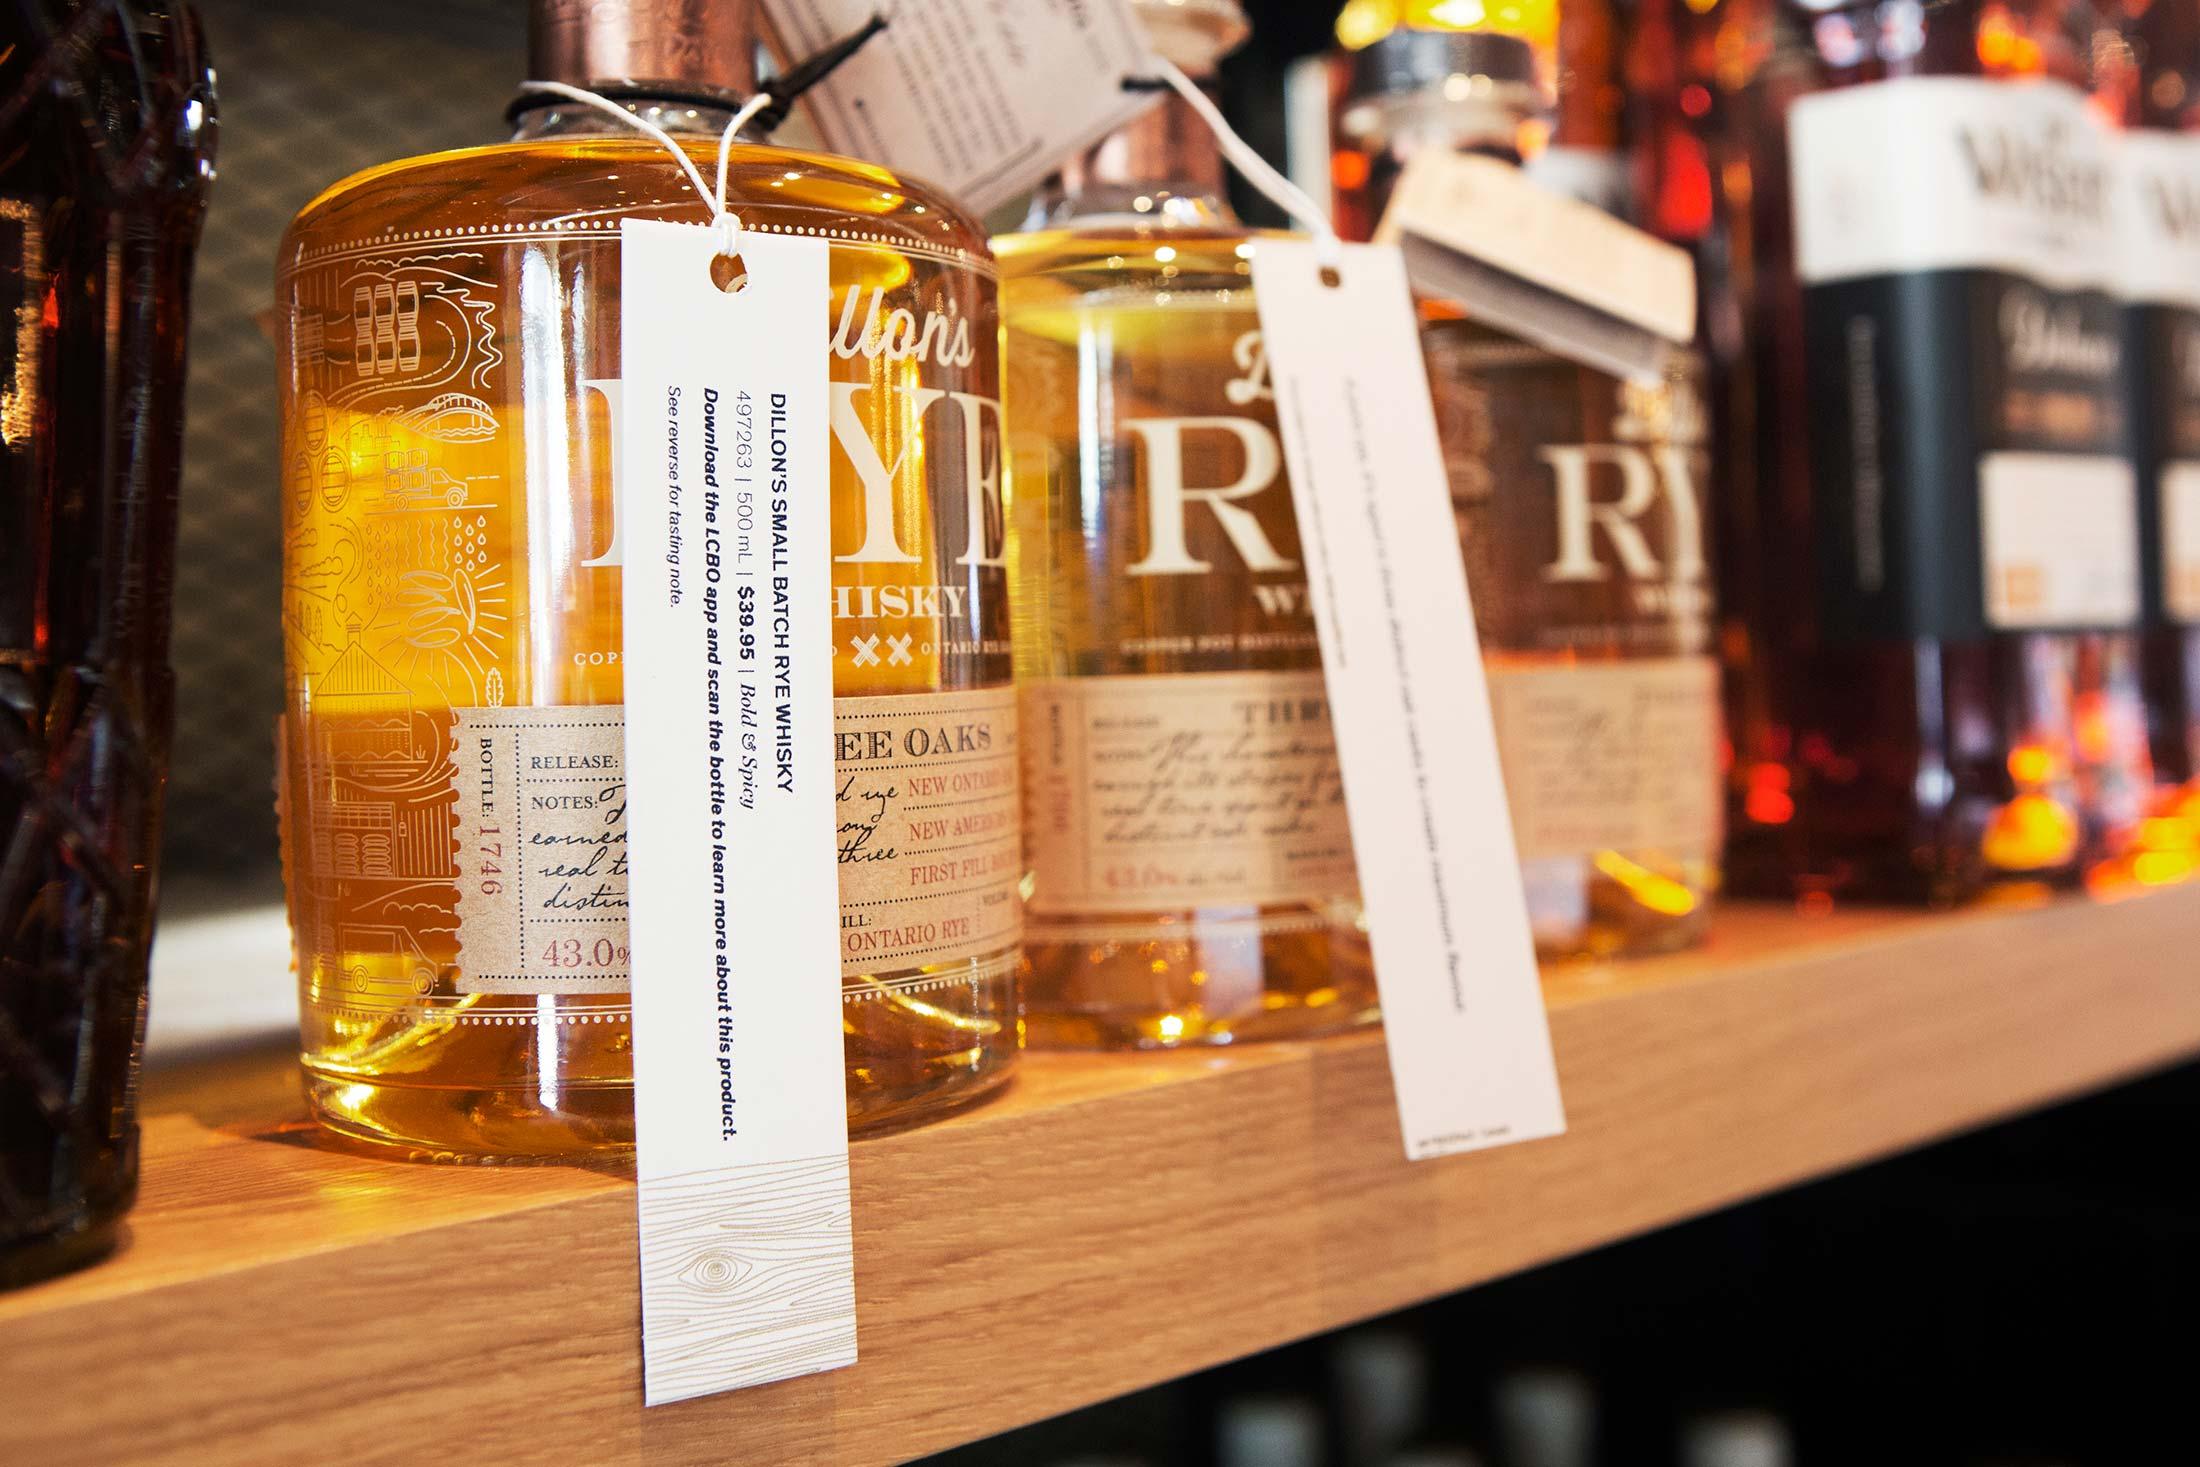 LCBO-whisky-bottles-pop-up-Toronto-Sputnik-Design-Partners.jpg